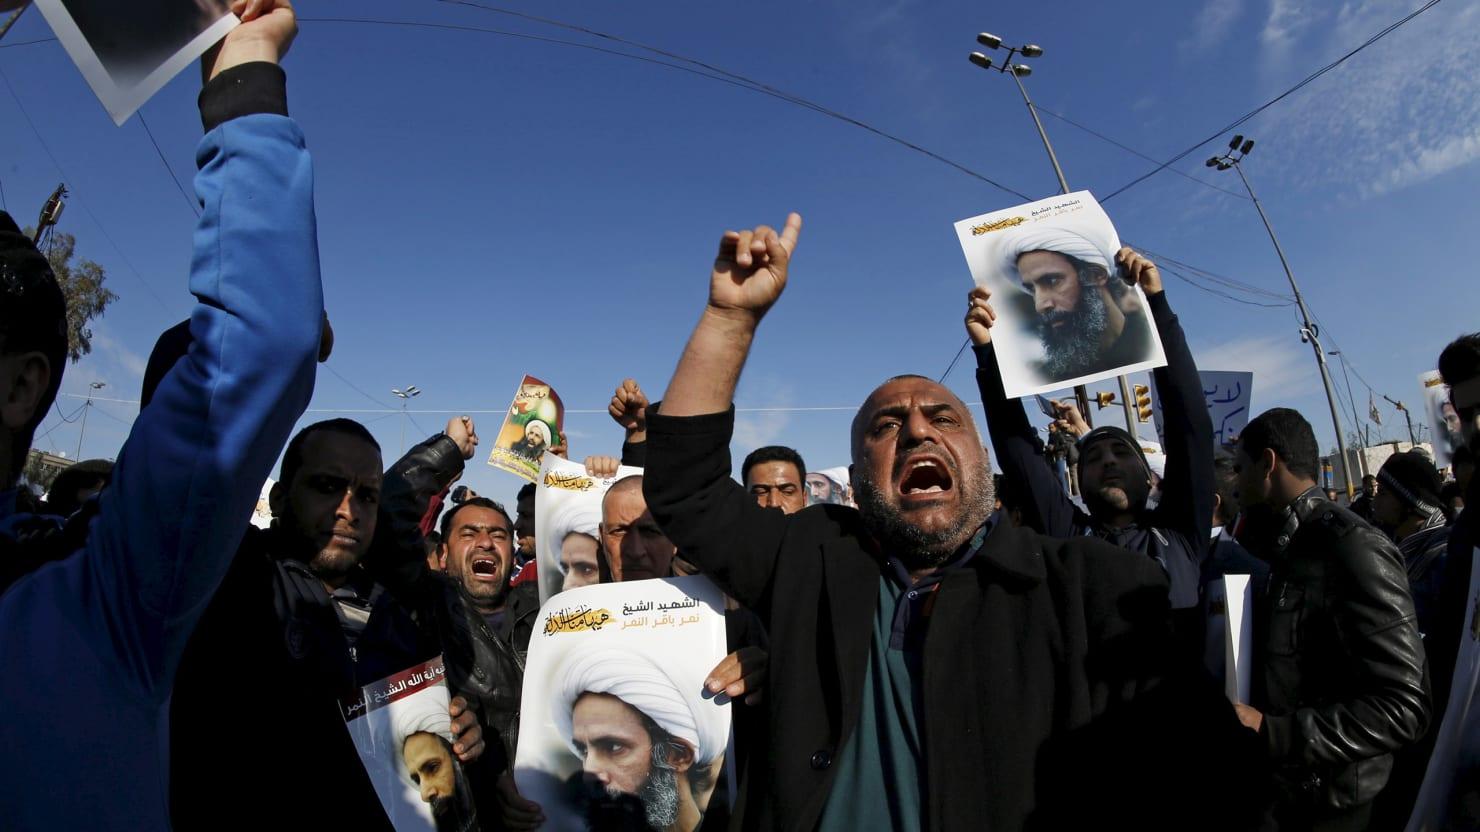 Did the Saudis Start This Mideast Crisis on Purpose?